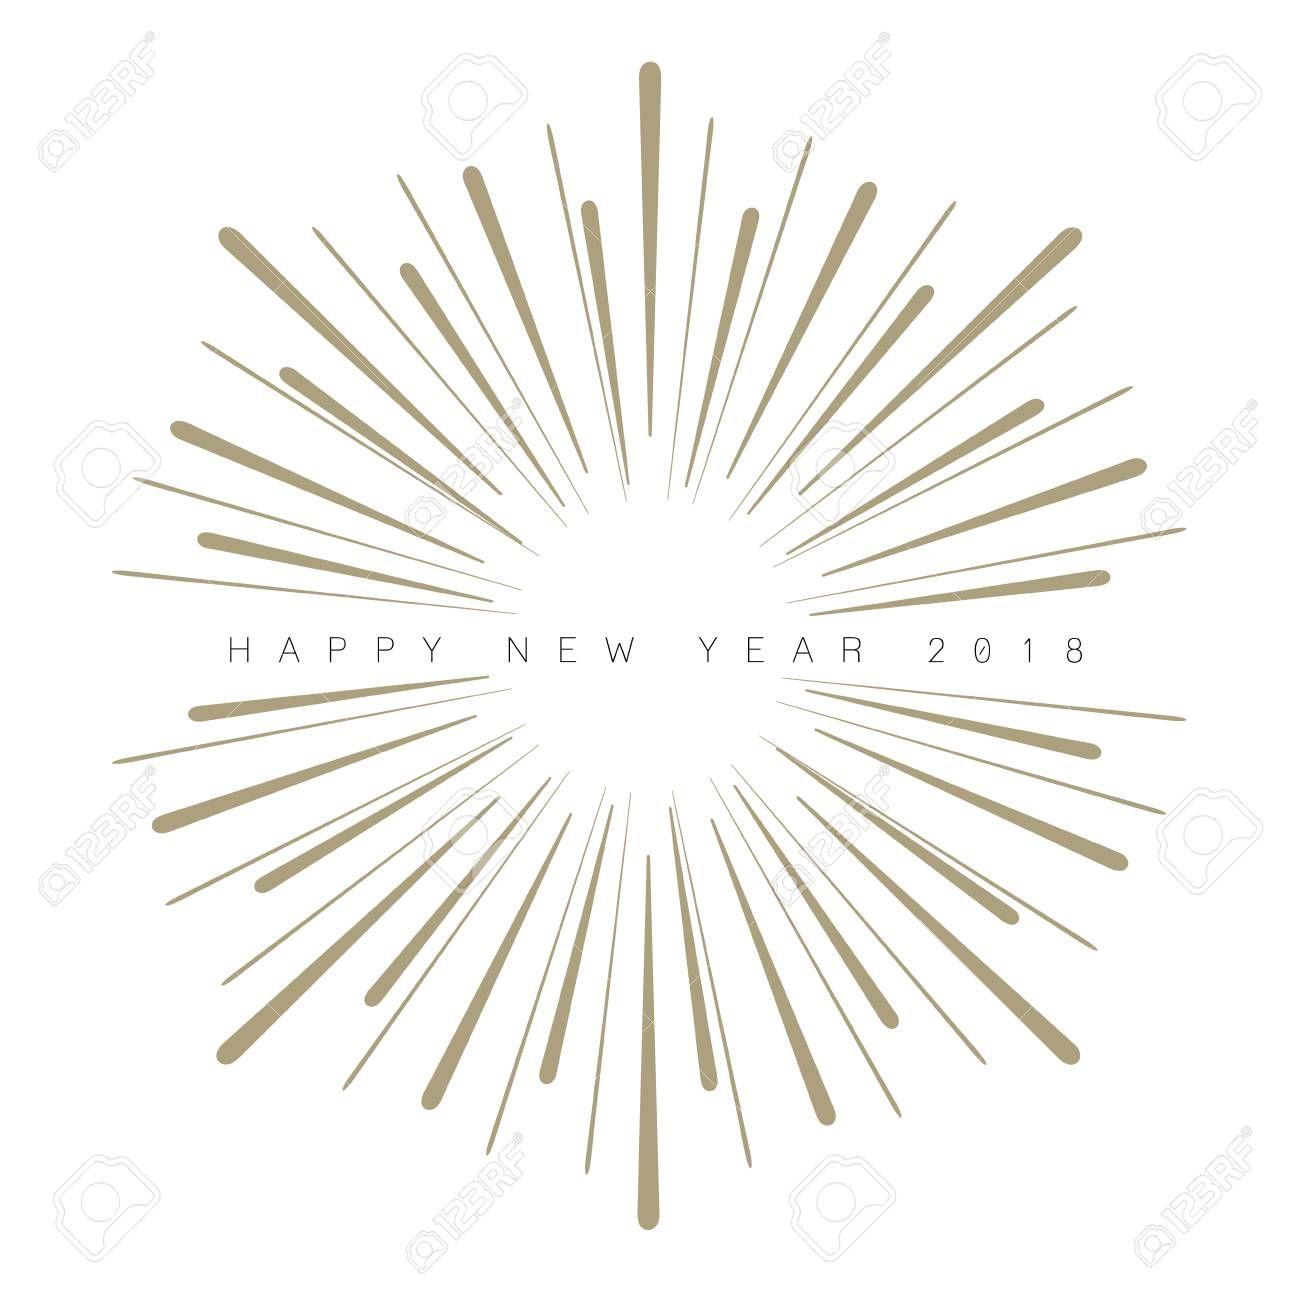 Happy New Year 2018 typography with explosive rays design illustration. ,  Sponsored,  typography,  Happy,  Year,  design,  illustration